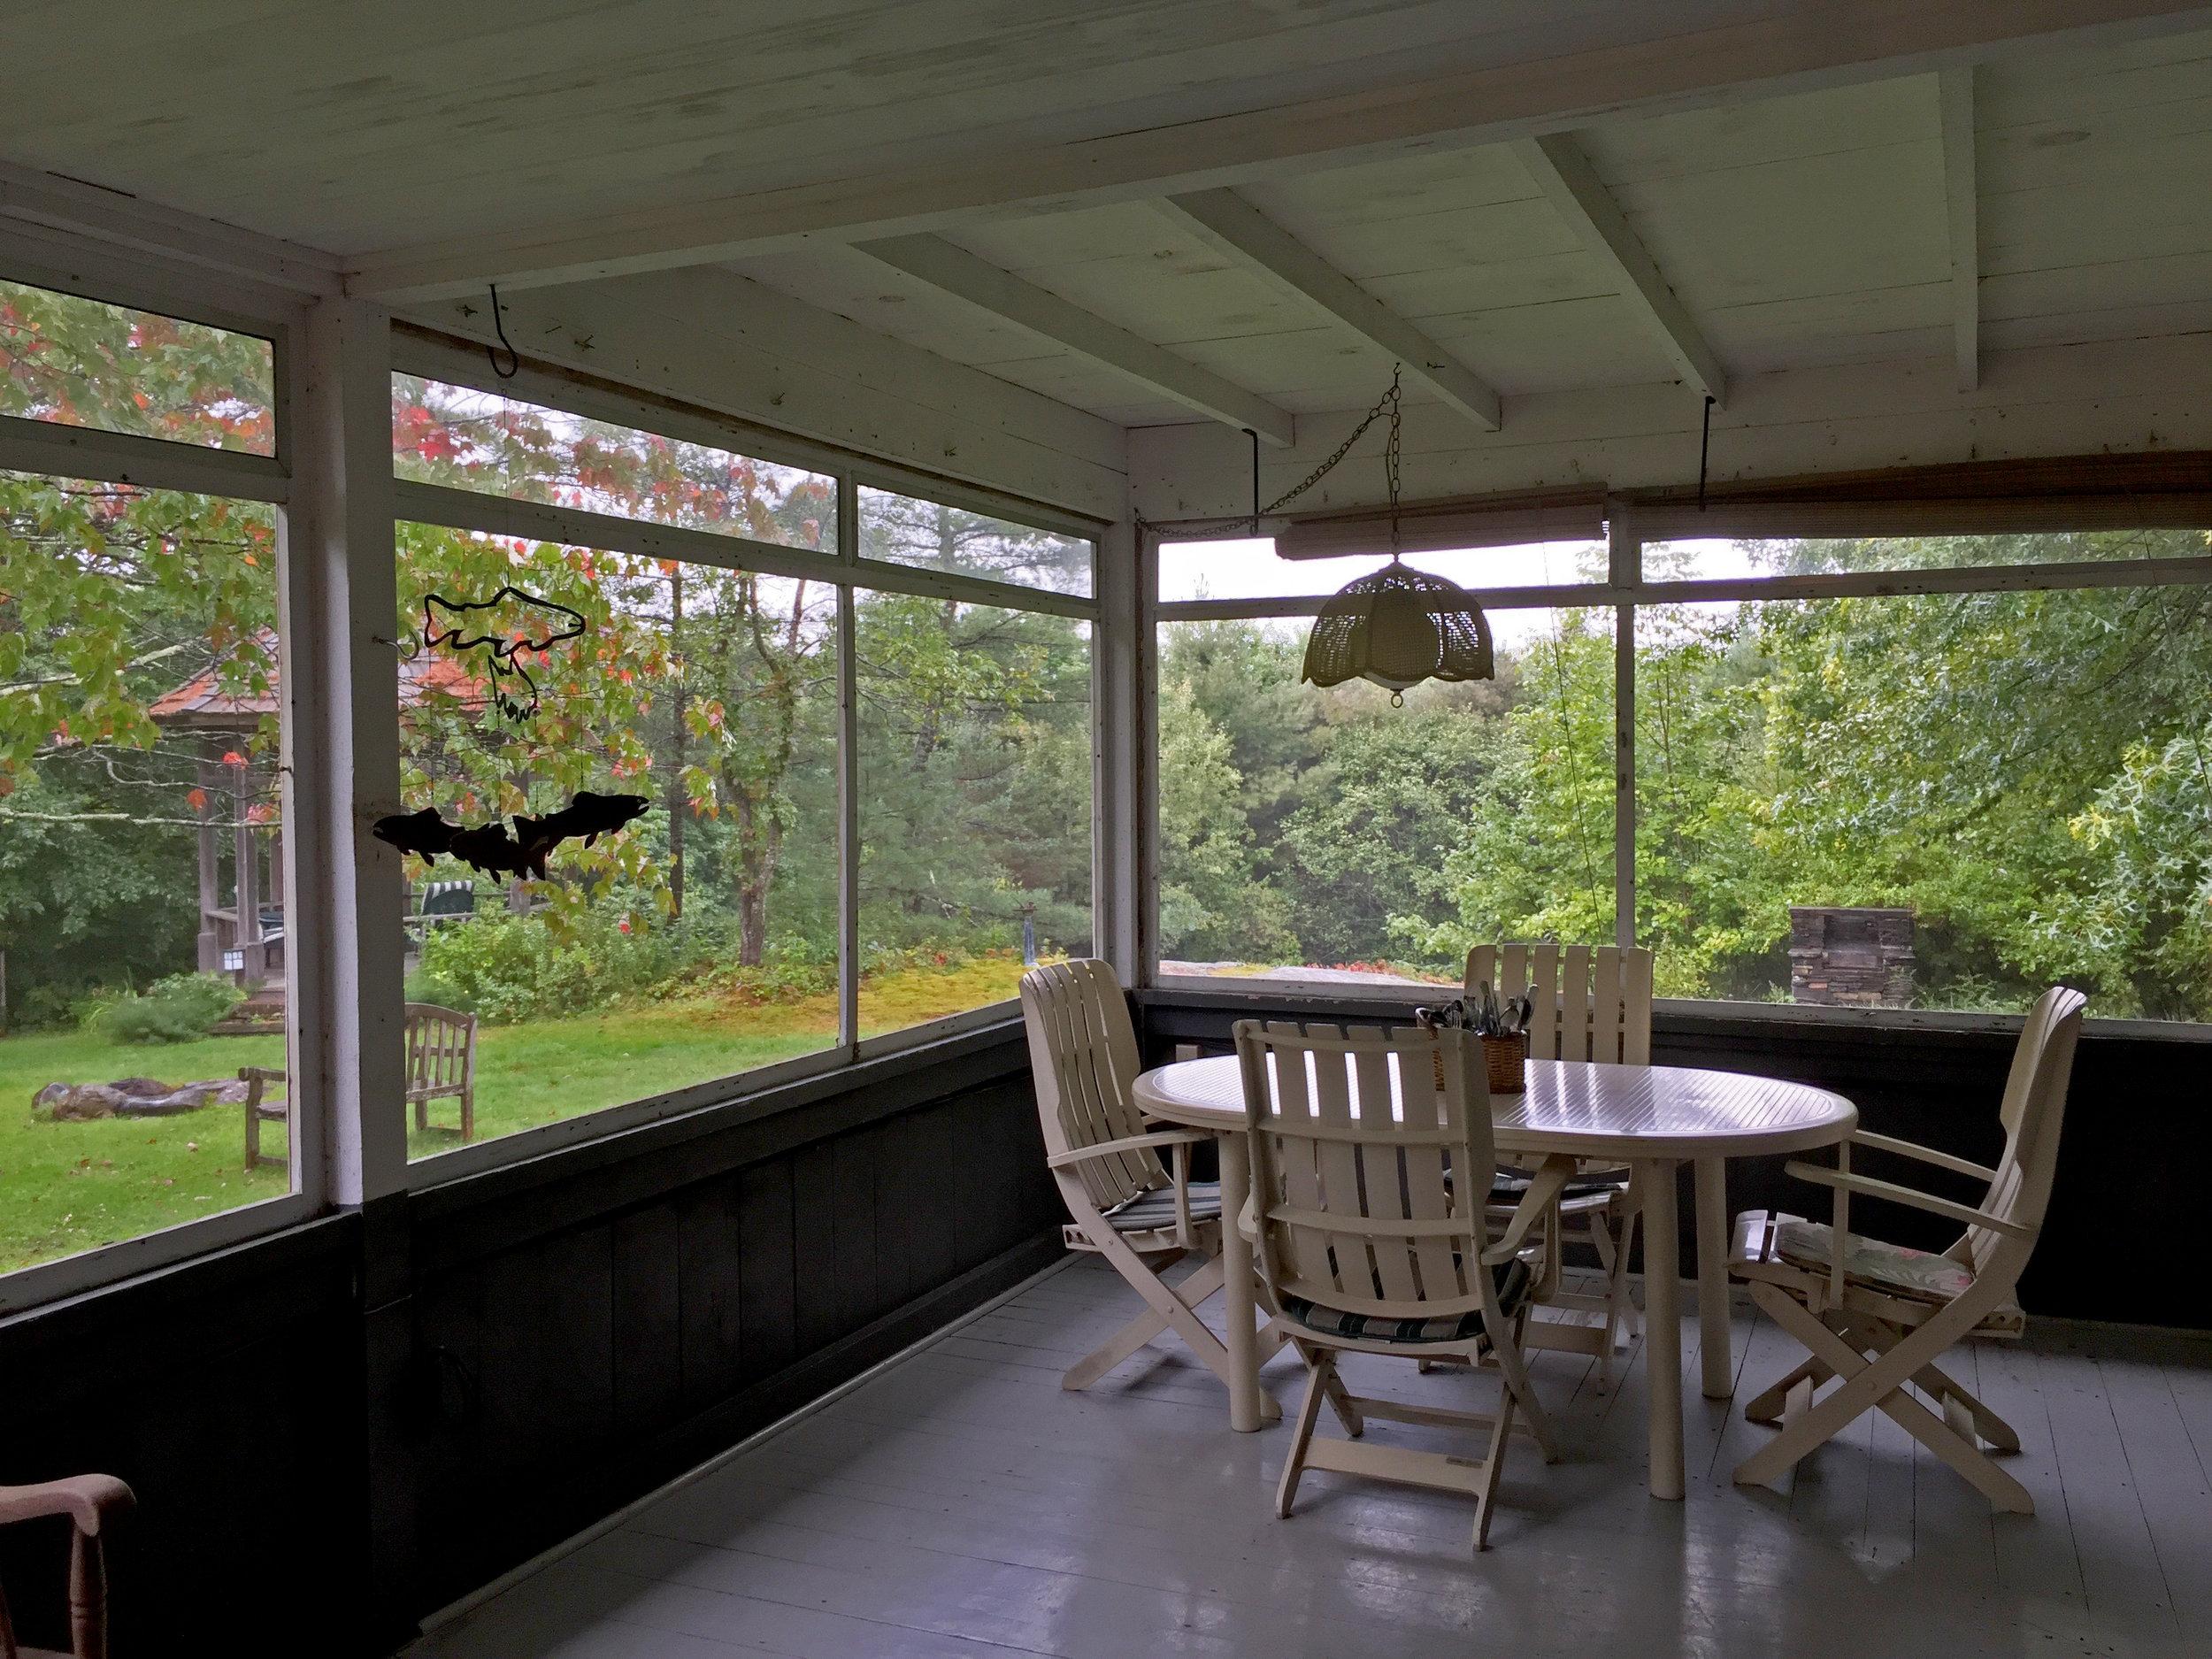 27-2017-09-02 IMG_1737Hanson Porch View to Gazebo.jpg